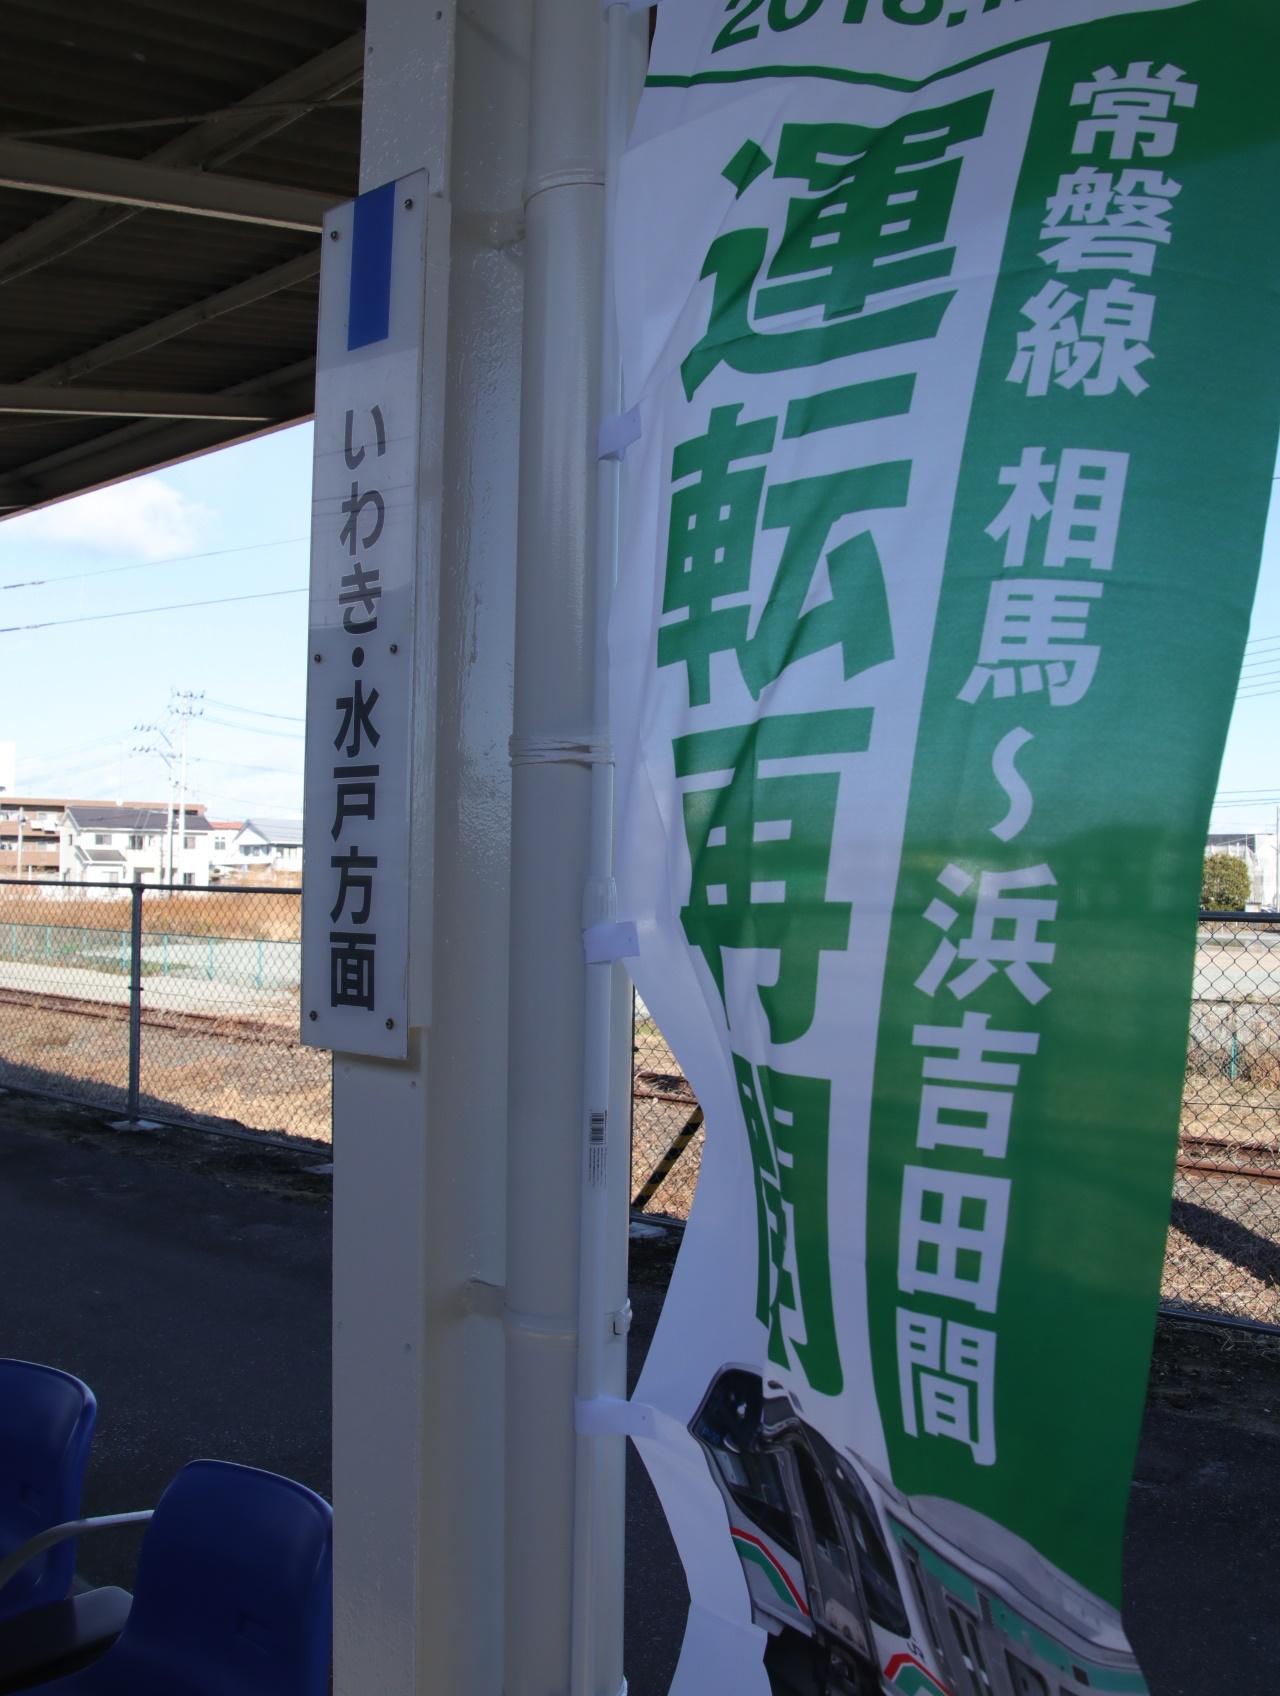 JR相馬駅まで目指します。_d0202264_16104369.jpg